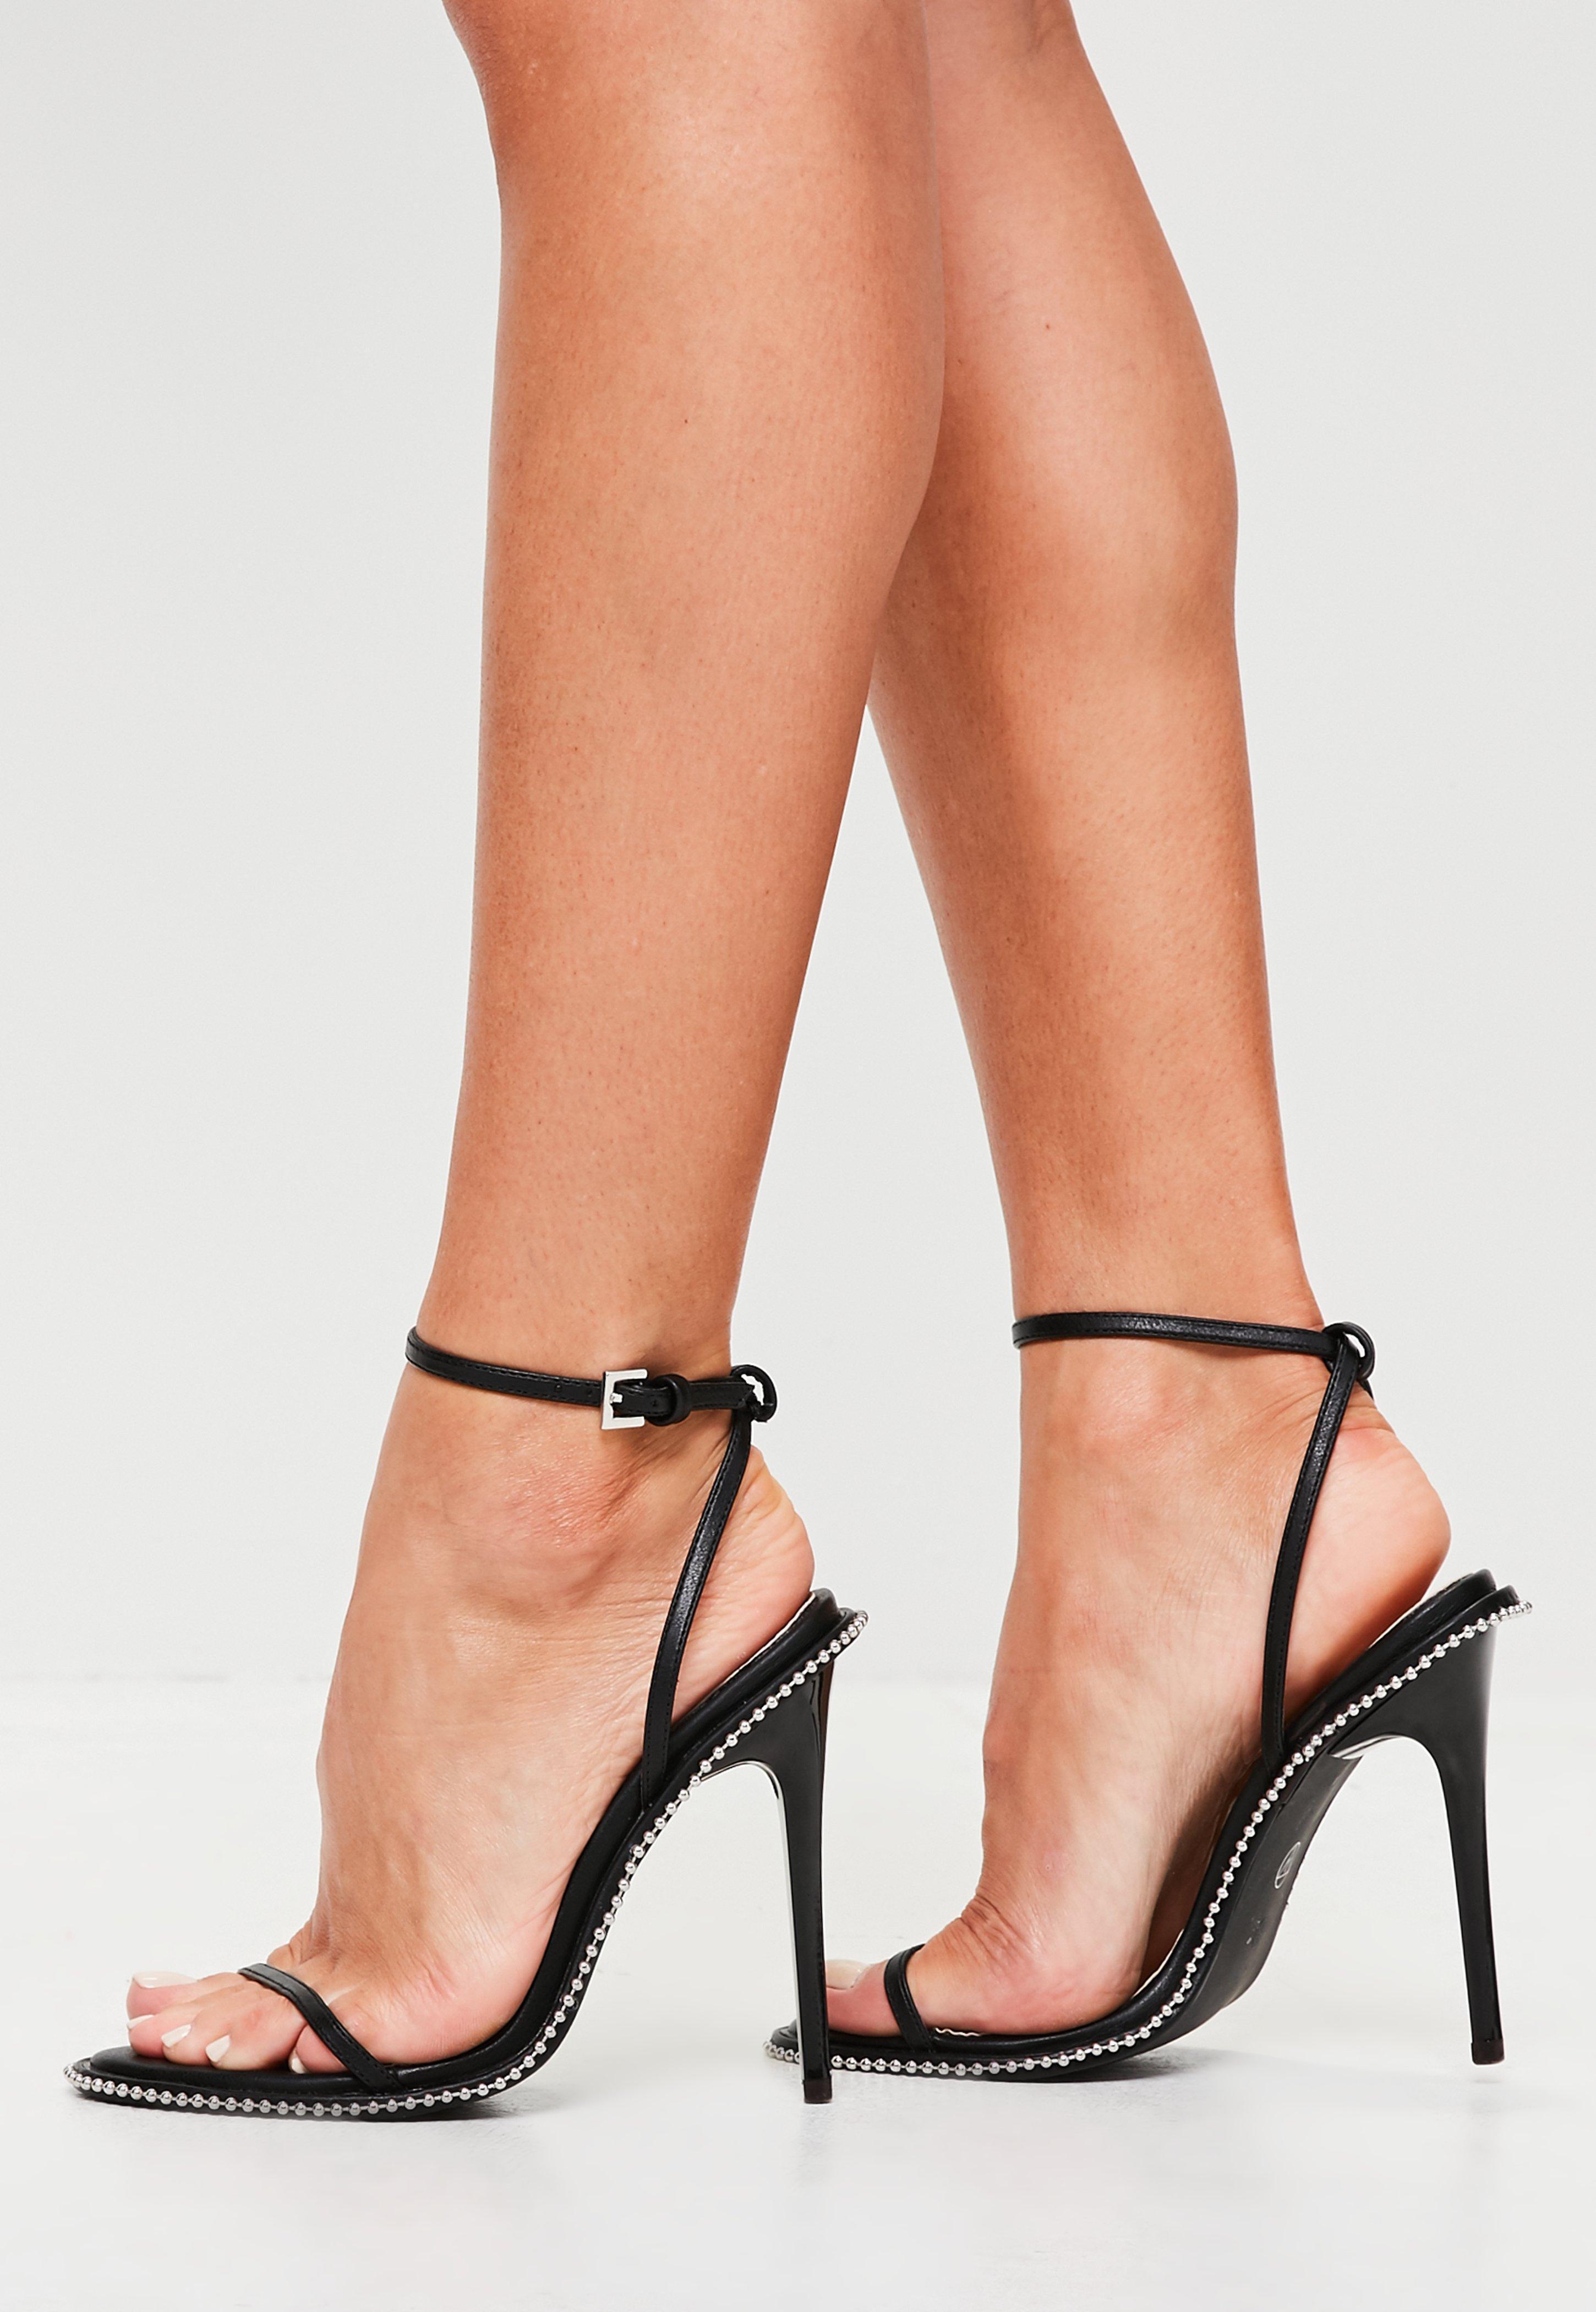 a854089962f Lyst - Missguided Black Chain Trim Sandals in Black